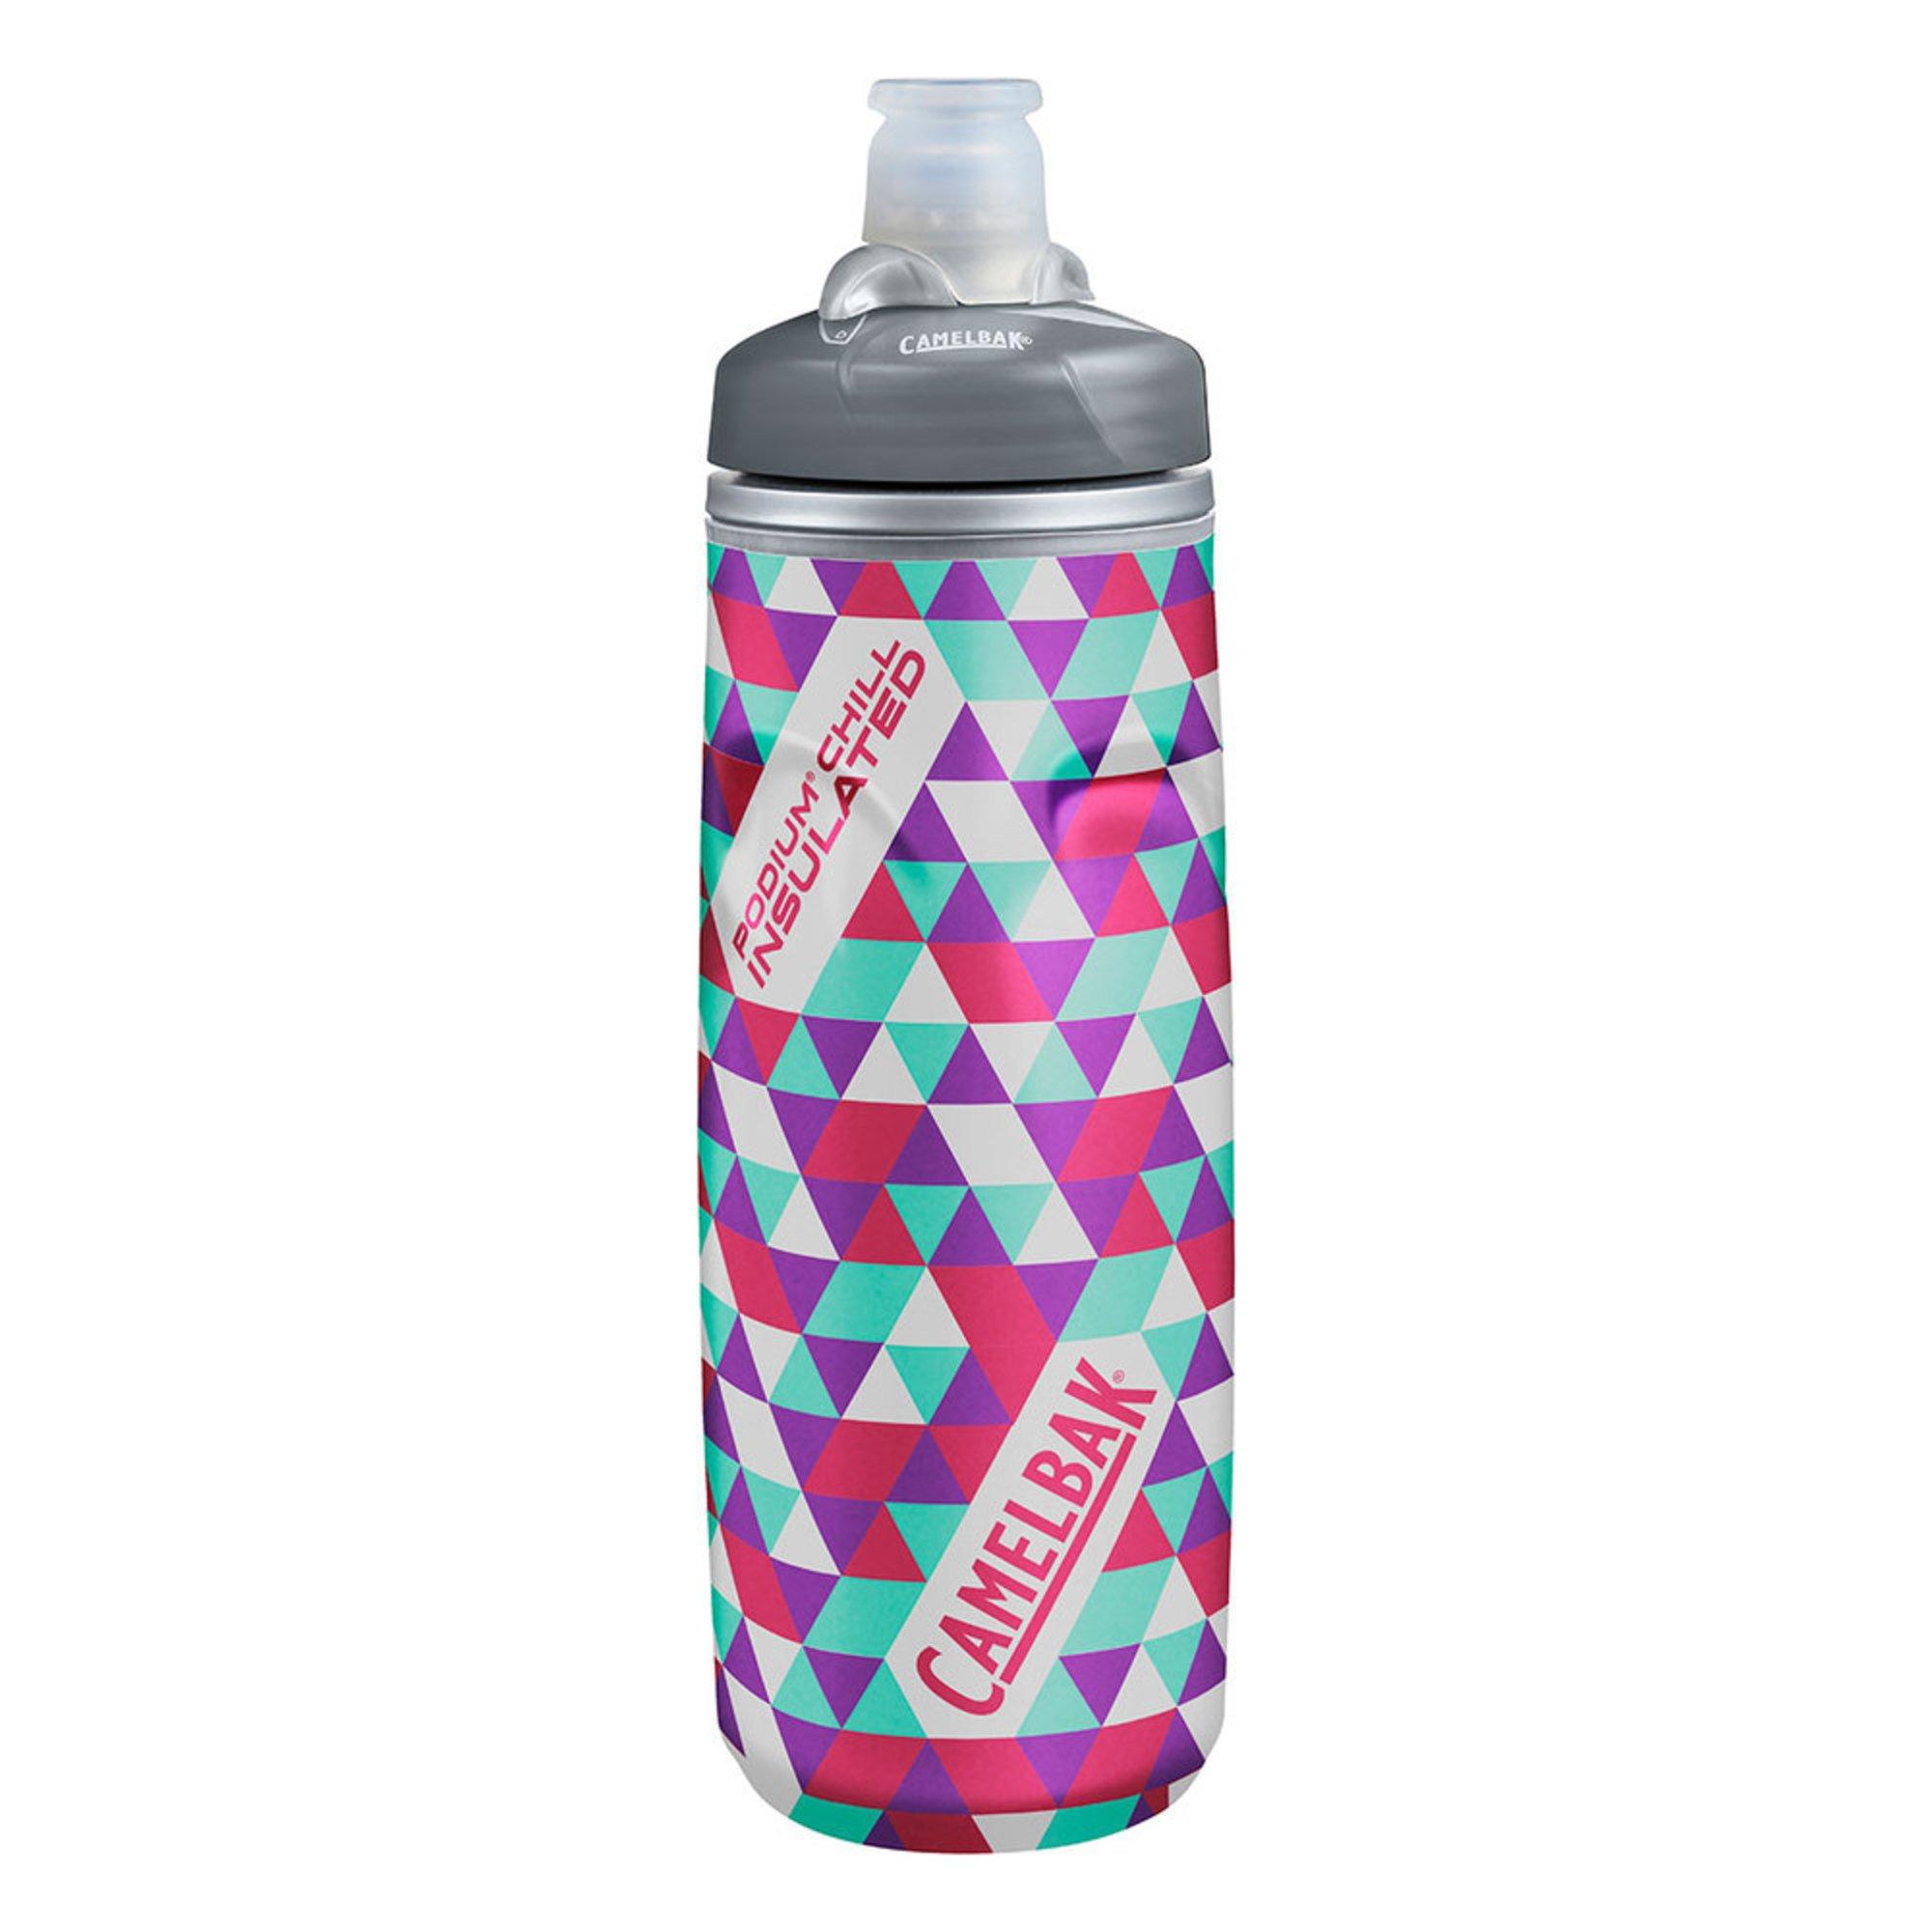 Camelbak 21 Oz Podium Chill Insulated Water Bottle - Kaleidoscope